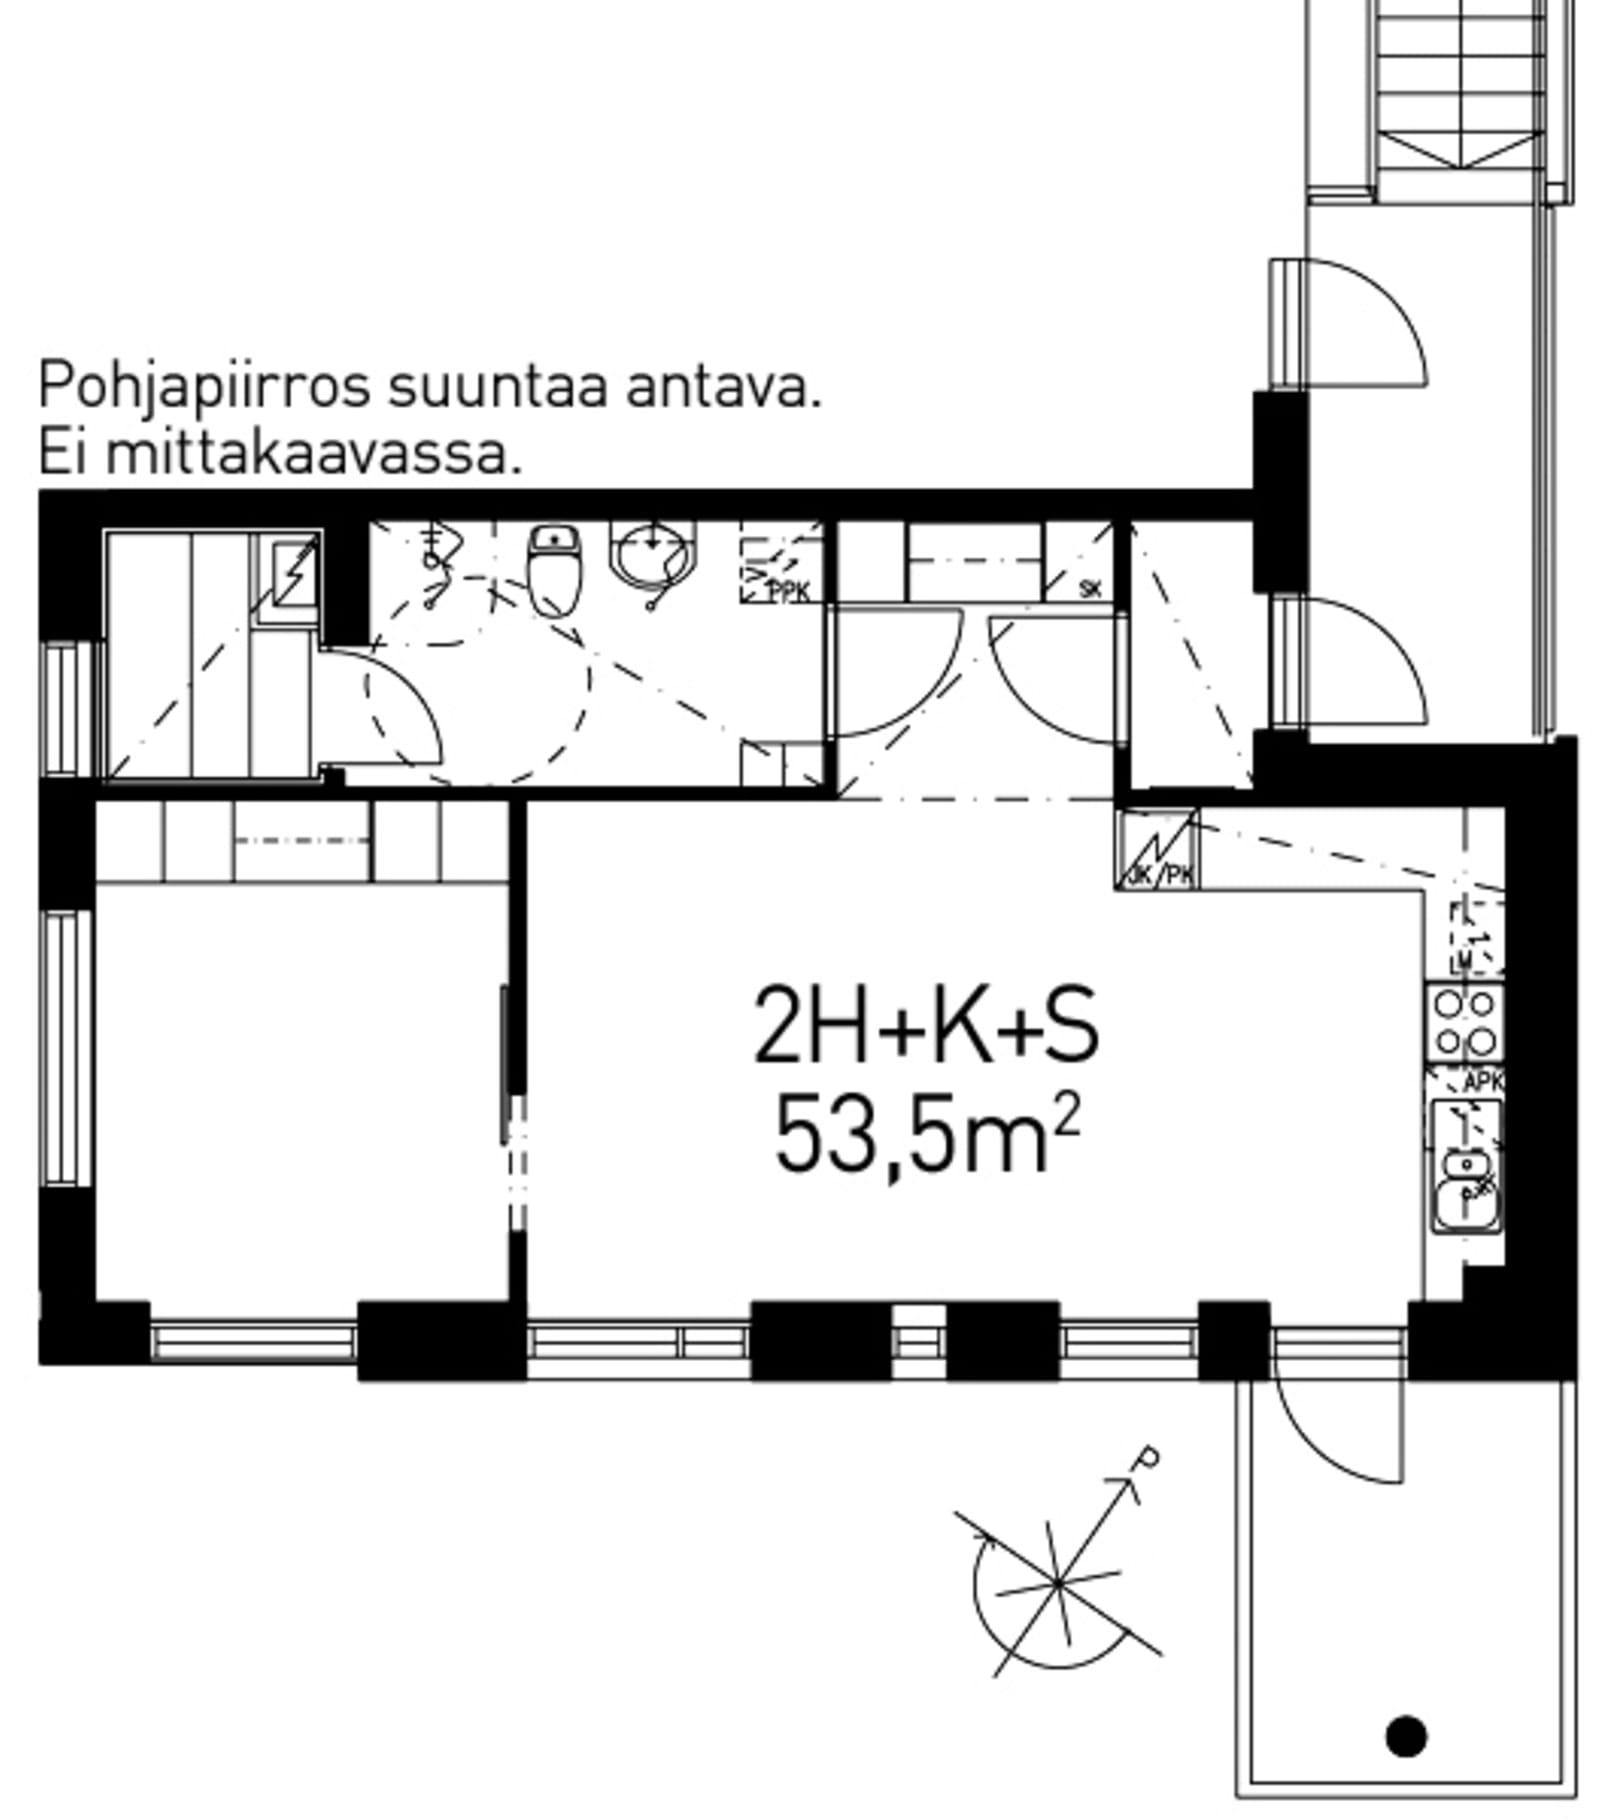 Helsinki, Viikki, Nils Westermarckin kuja 18 D 051